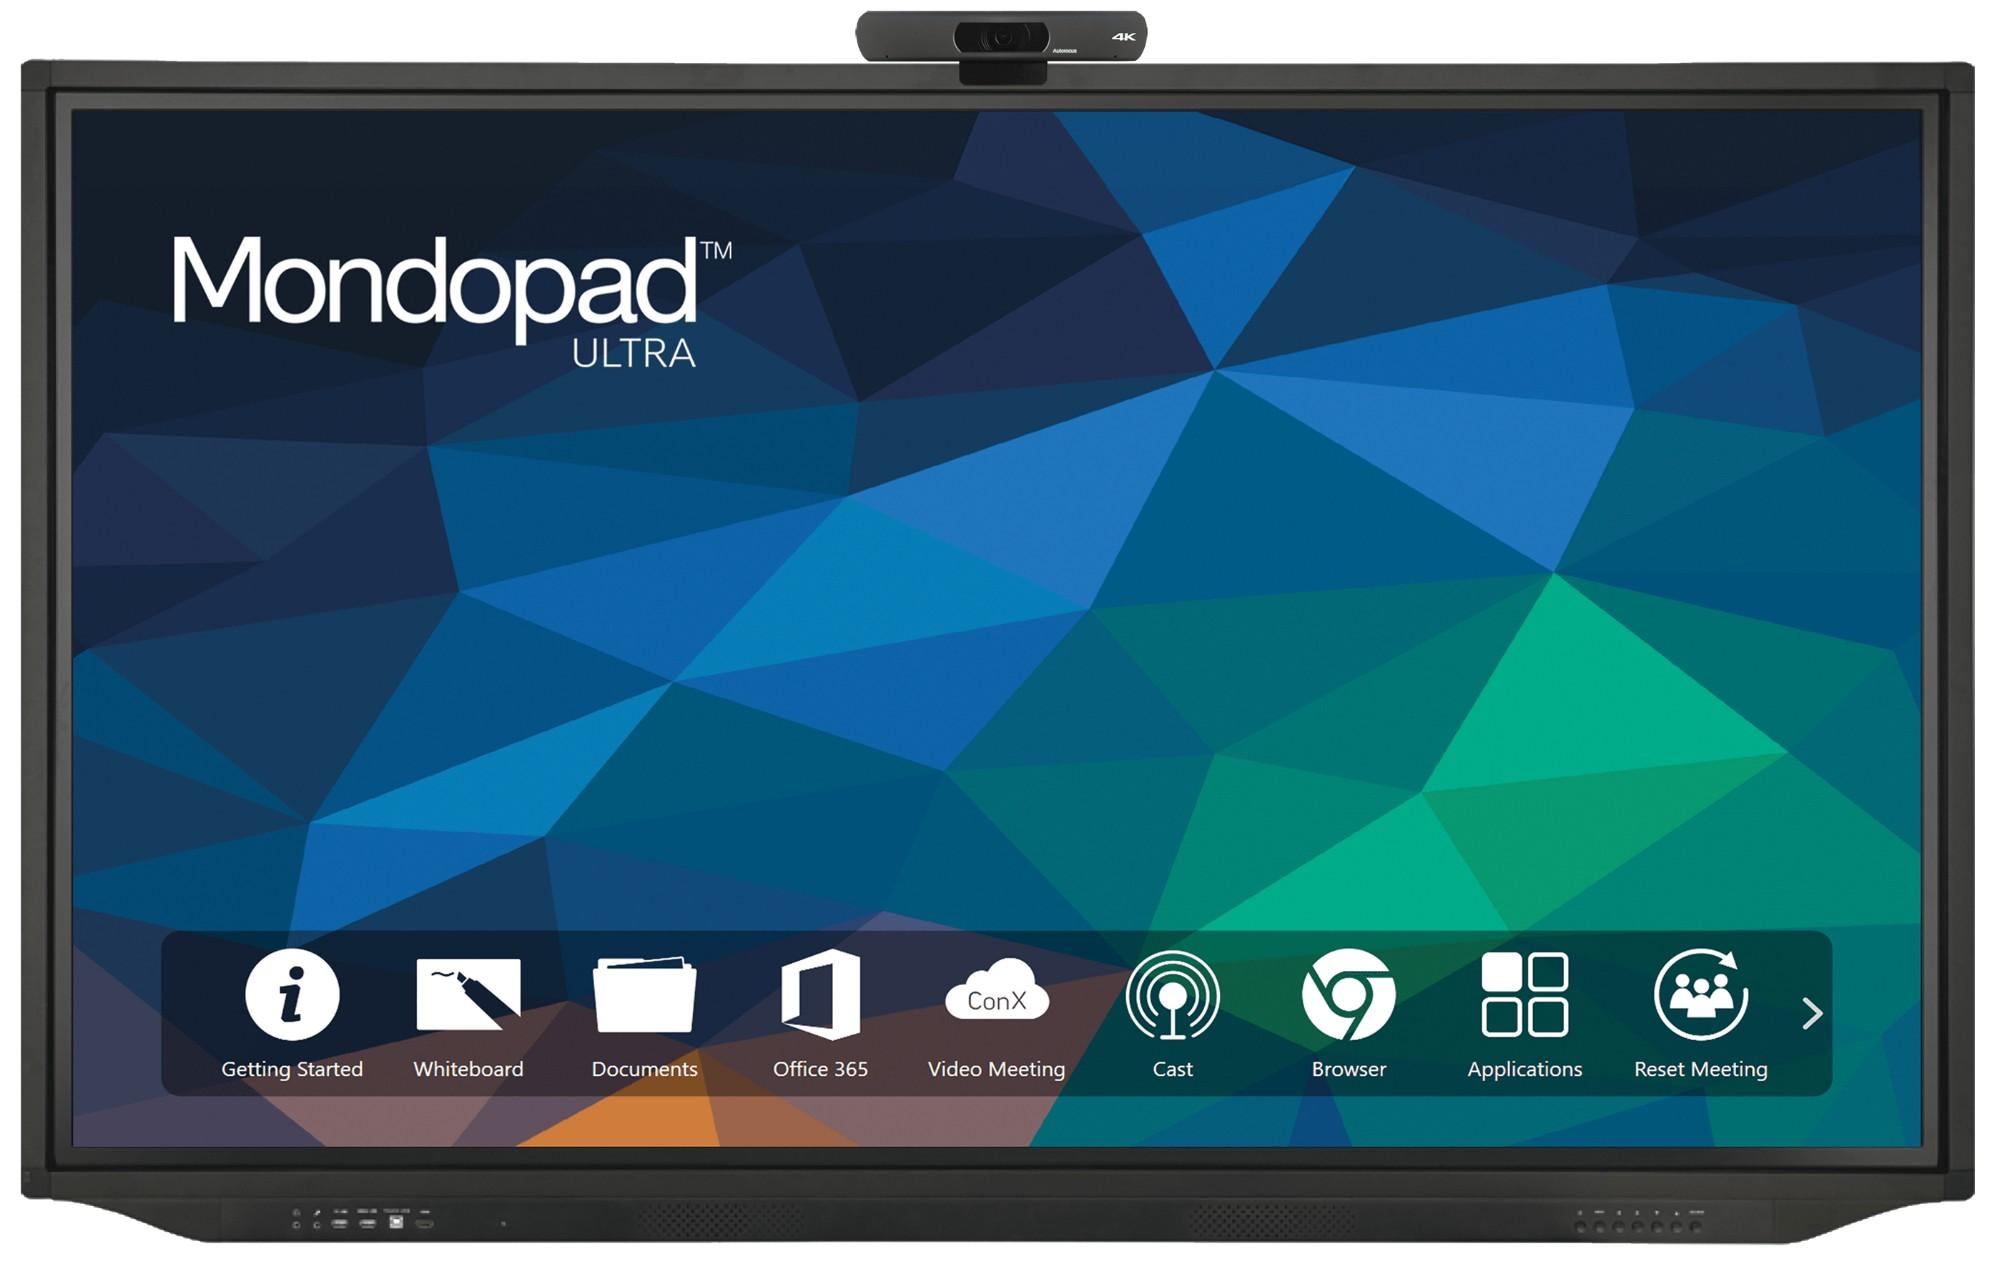 Mondopad Ultra 55in INF55MU01 - 4K UHD touch - i7 7500U - 8GB Ram - 256GB SSD - Win10 Pro / Android (v5.0)